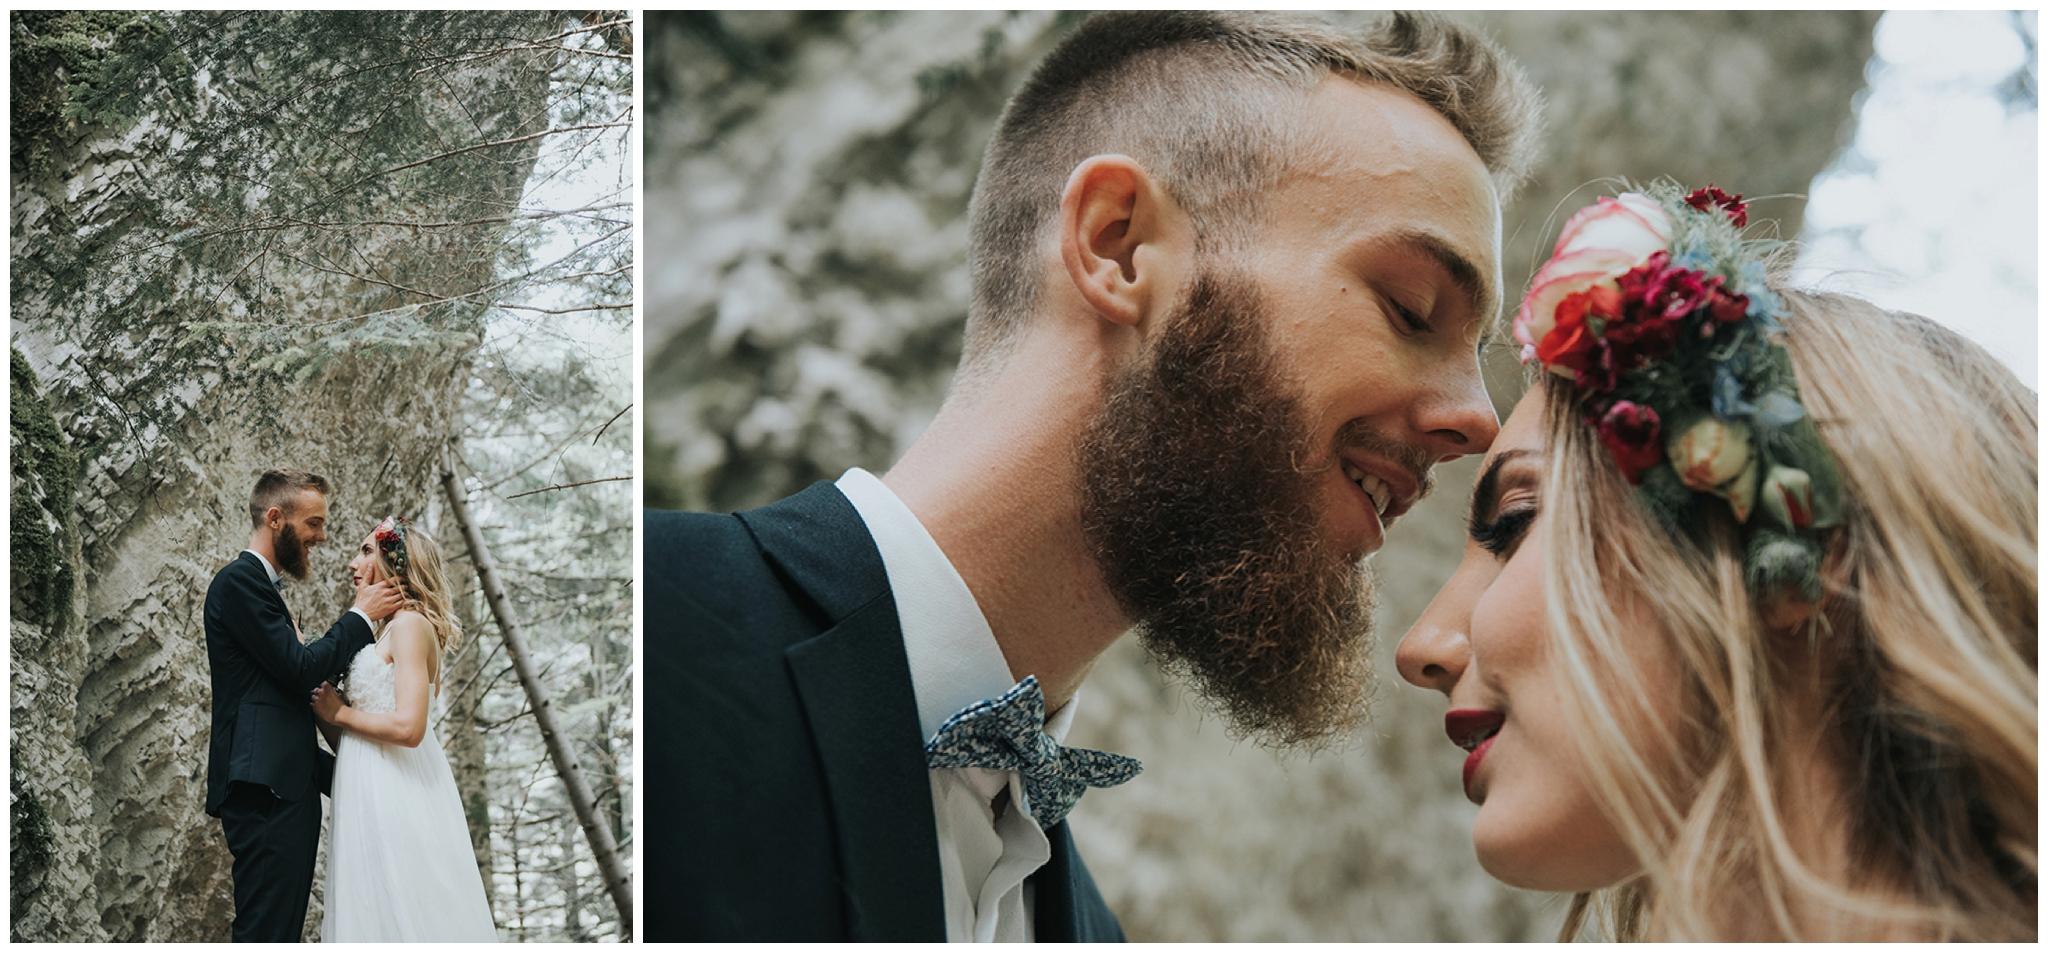 photographe-mariage-grenoble-annecy-lyon-shooting-inspiration-boheme-025